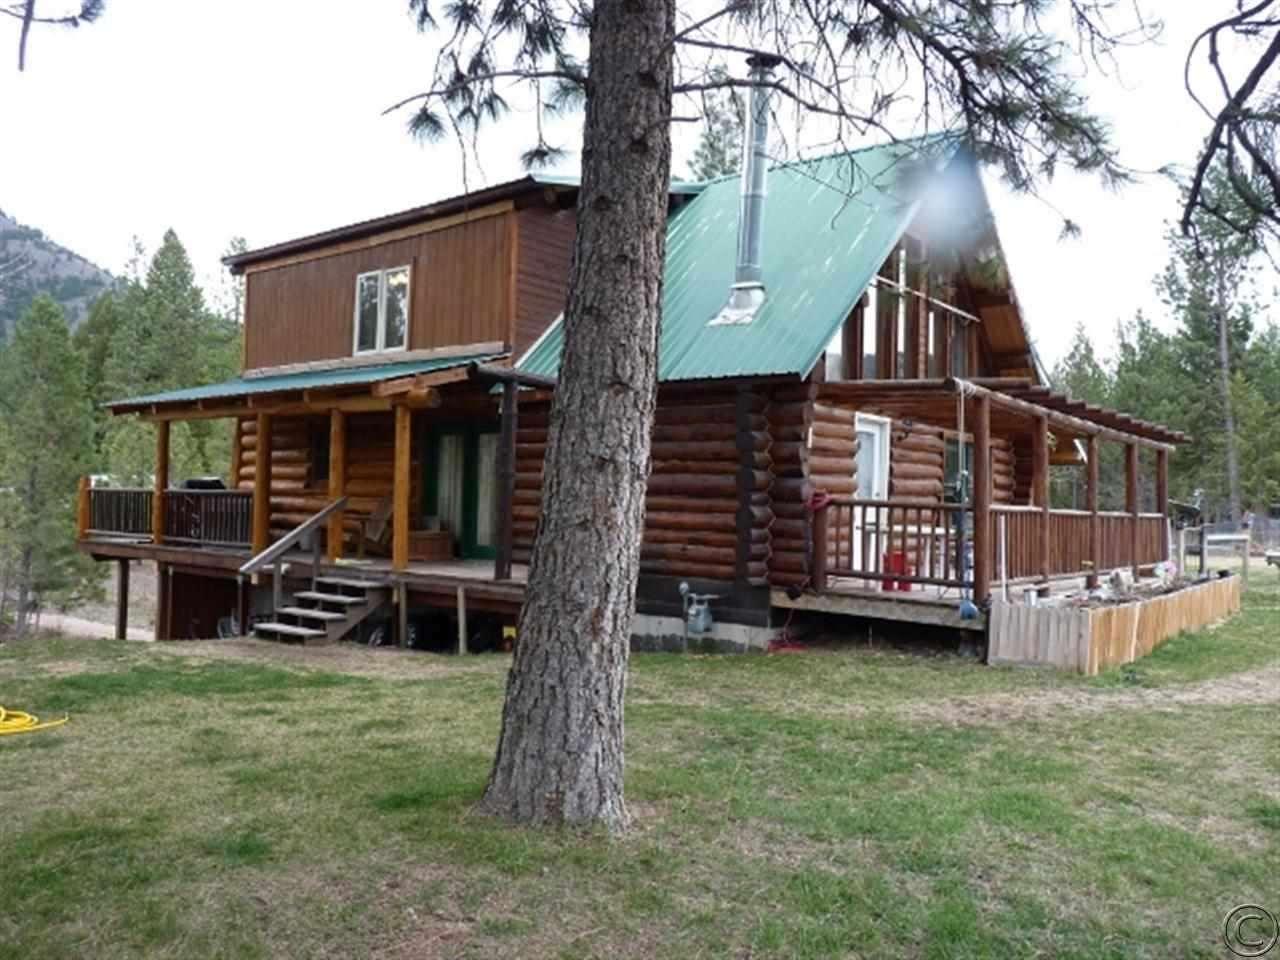 Real Estate for Sale, ListingId: 32274930, Clinton,MT59825